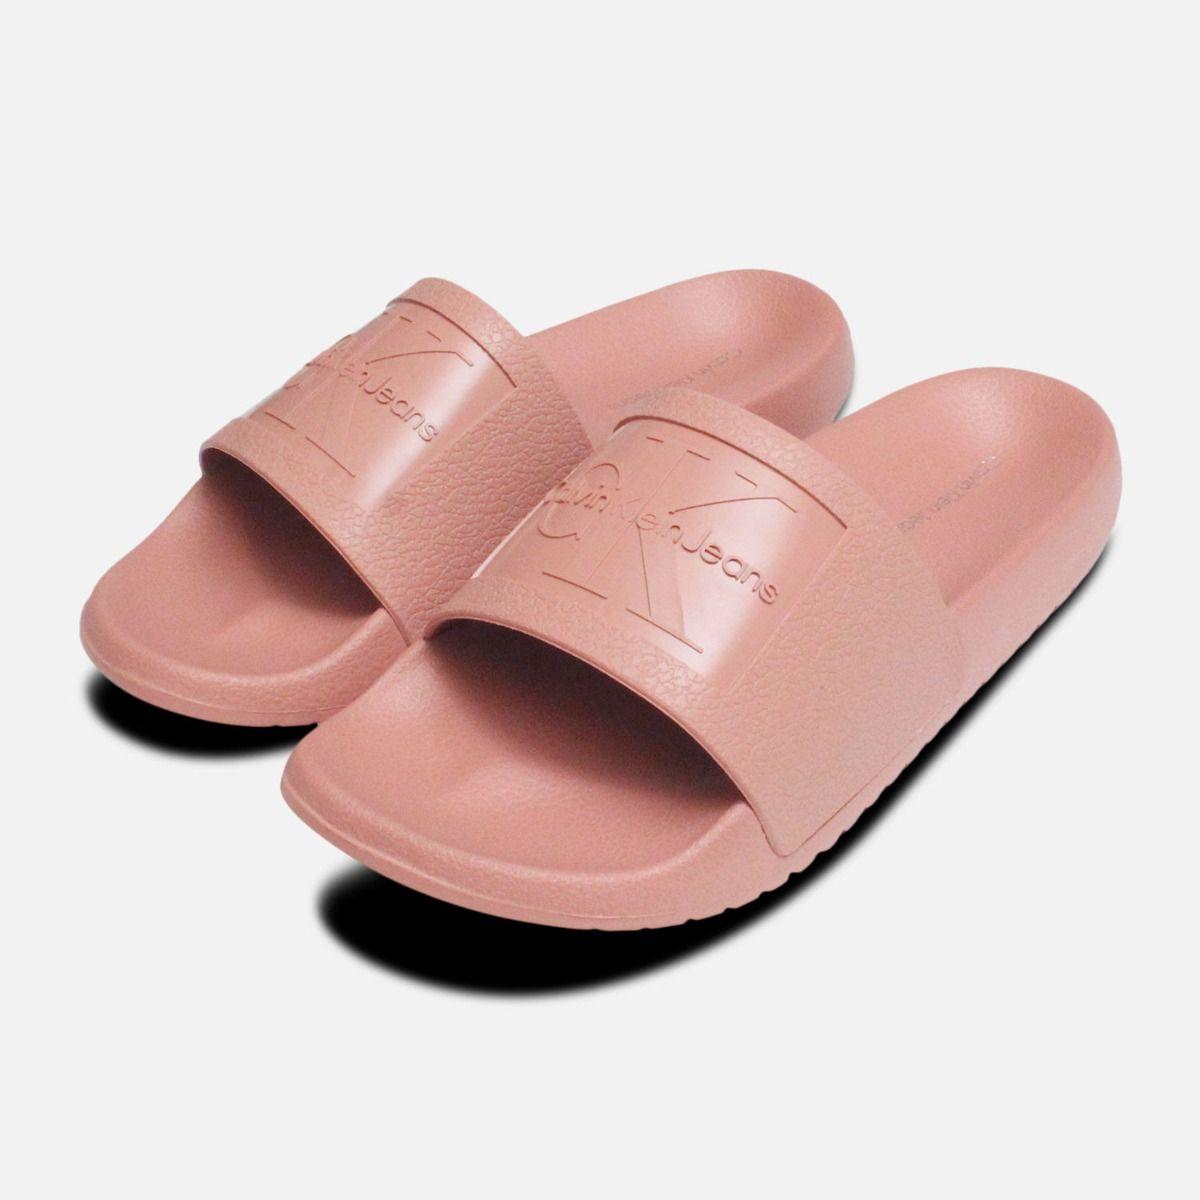 88c11cfe52a9 Dusk Pink Jelly Calvin Klein Sandals Christie Slide